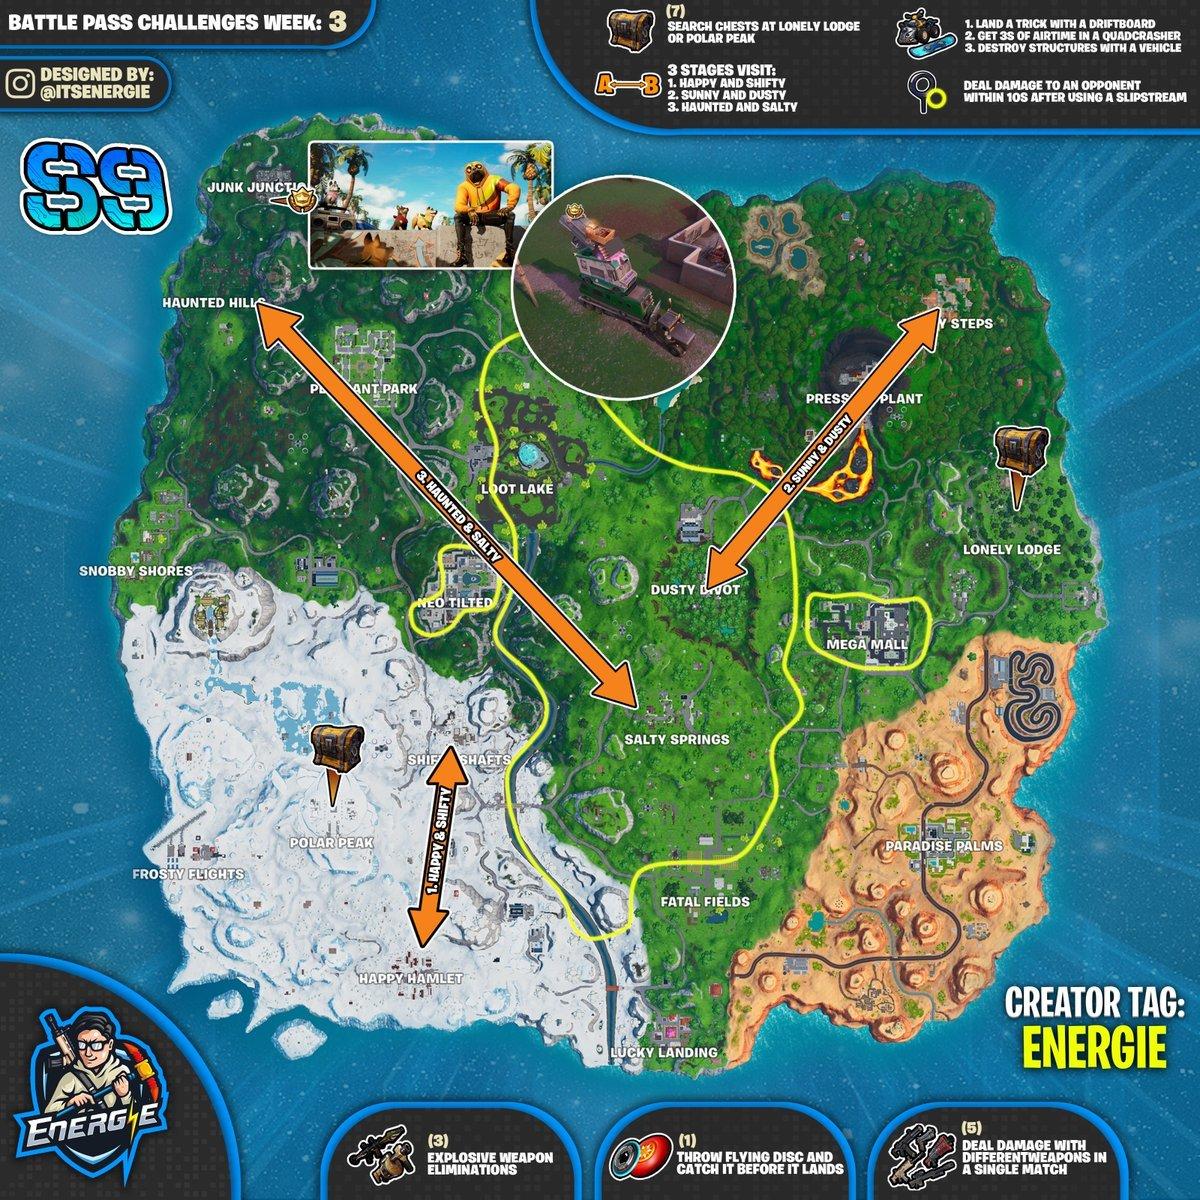 Fortnite Cheat Sheet Map For Season 9, Week 3 Challenges | Fortnite